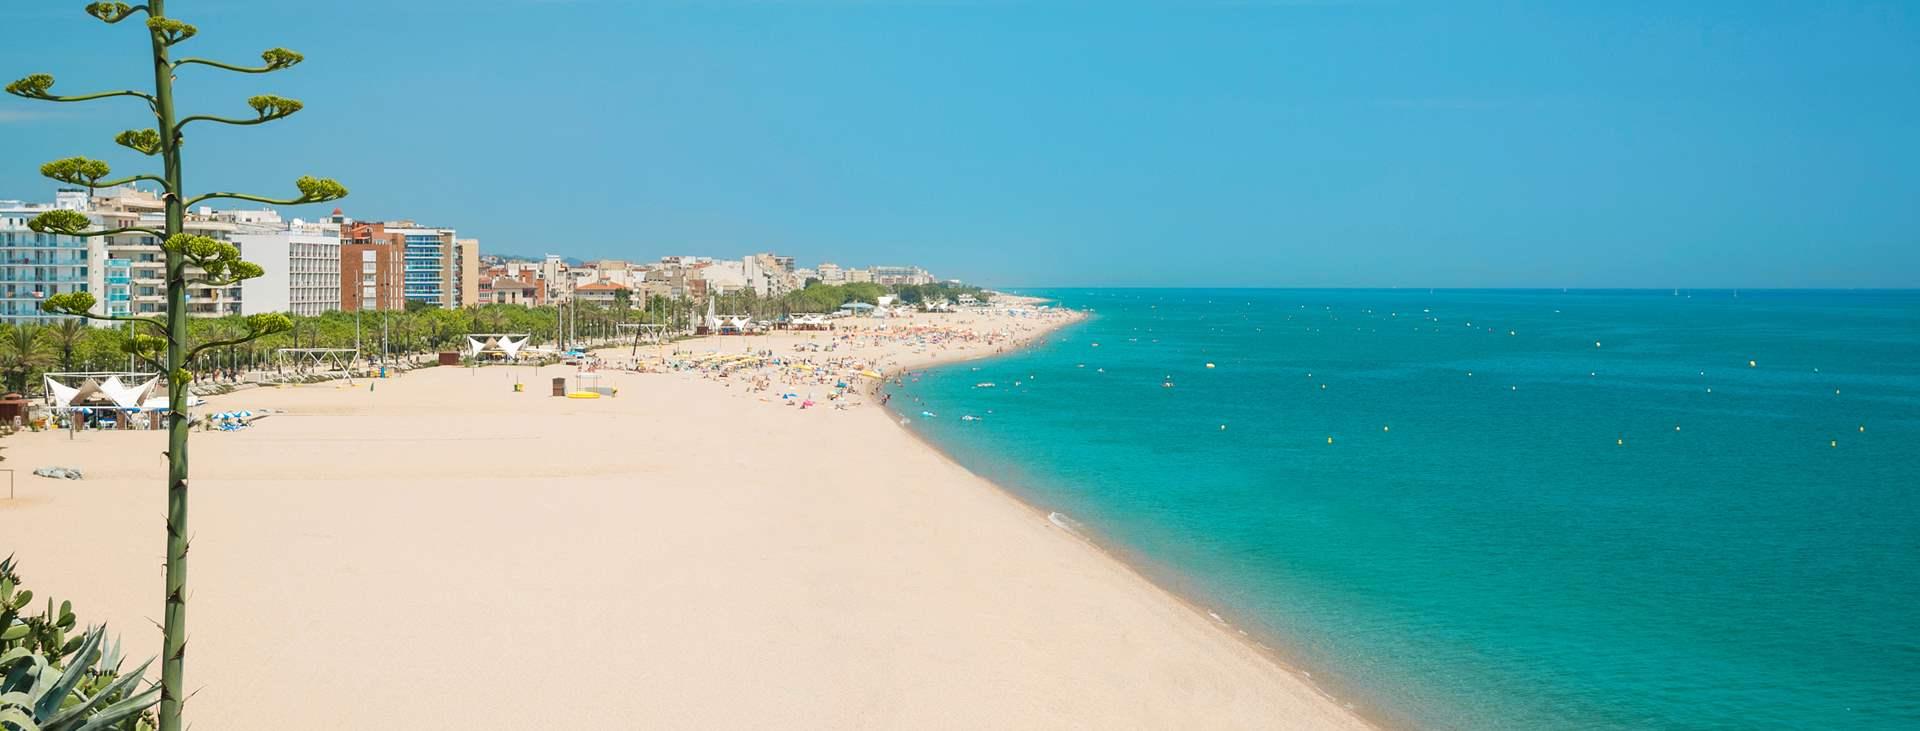 Matkat Calellaan, Costa Bravaan Espanjaan